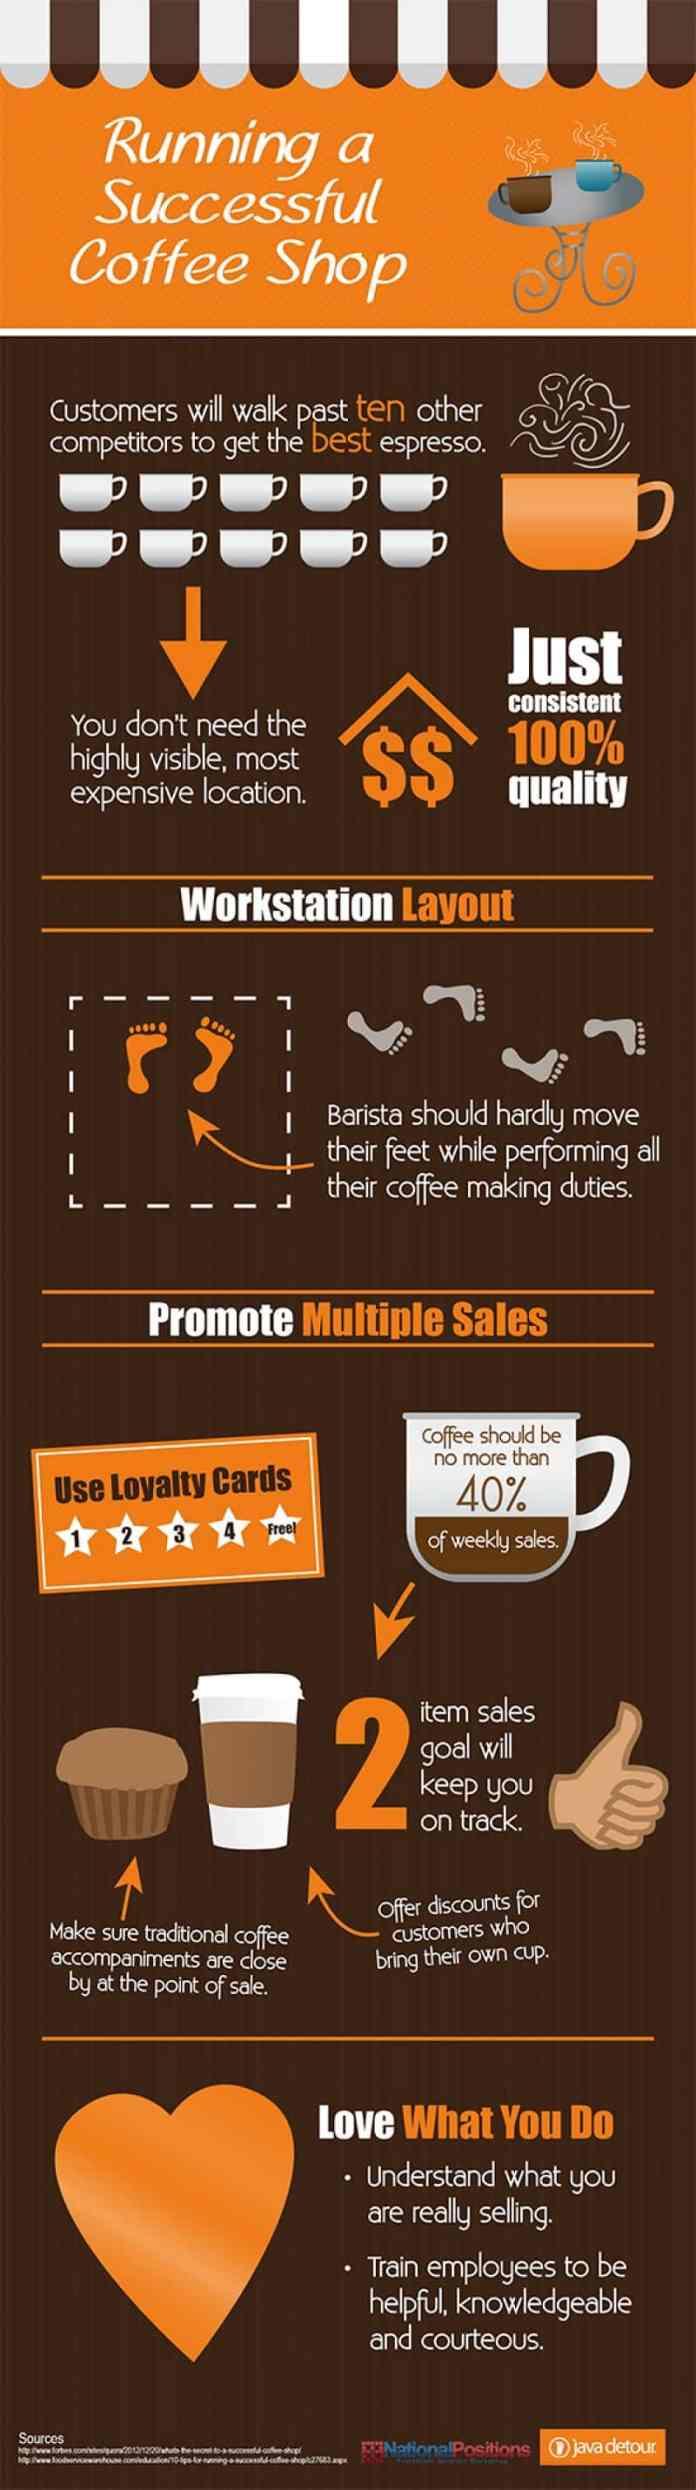 coffee shop success tips